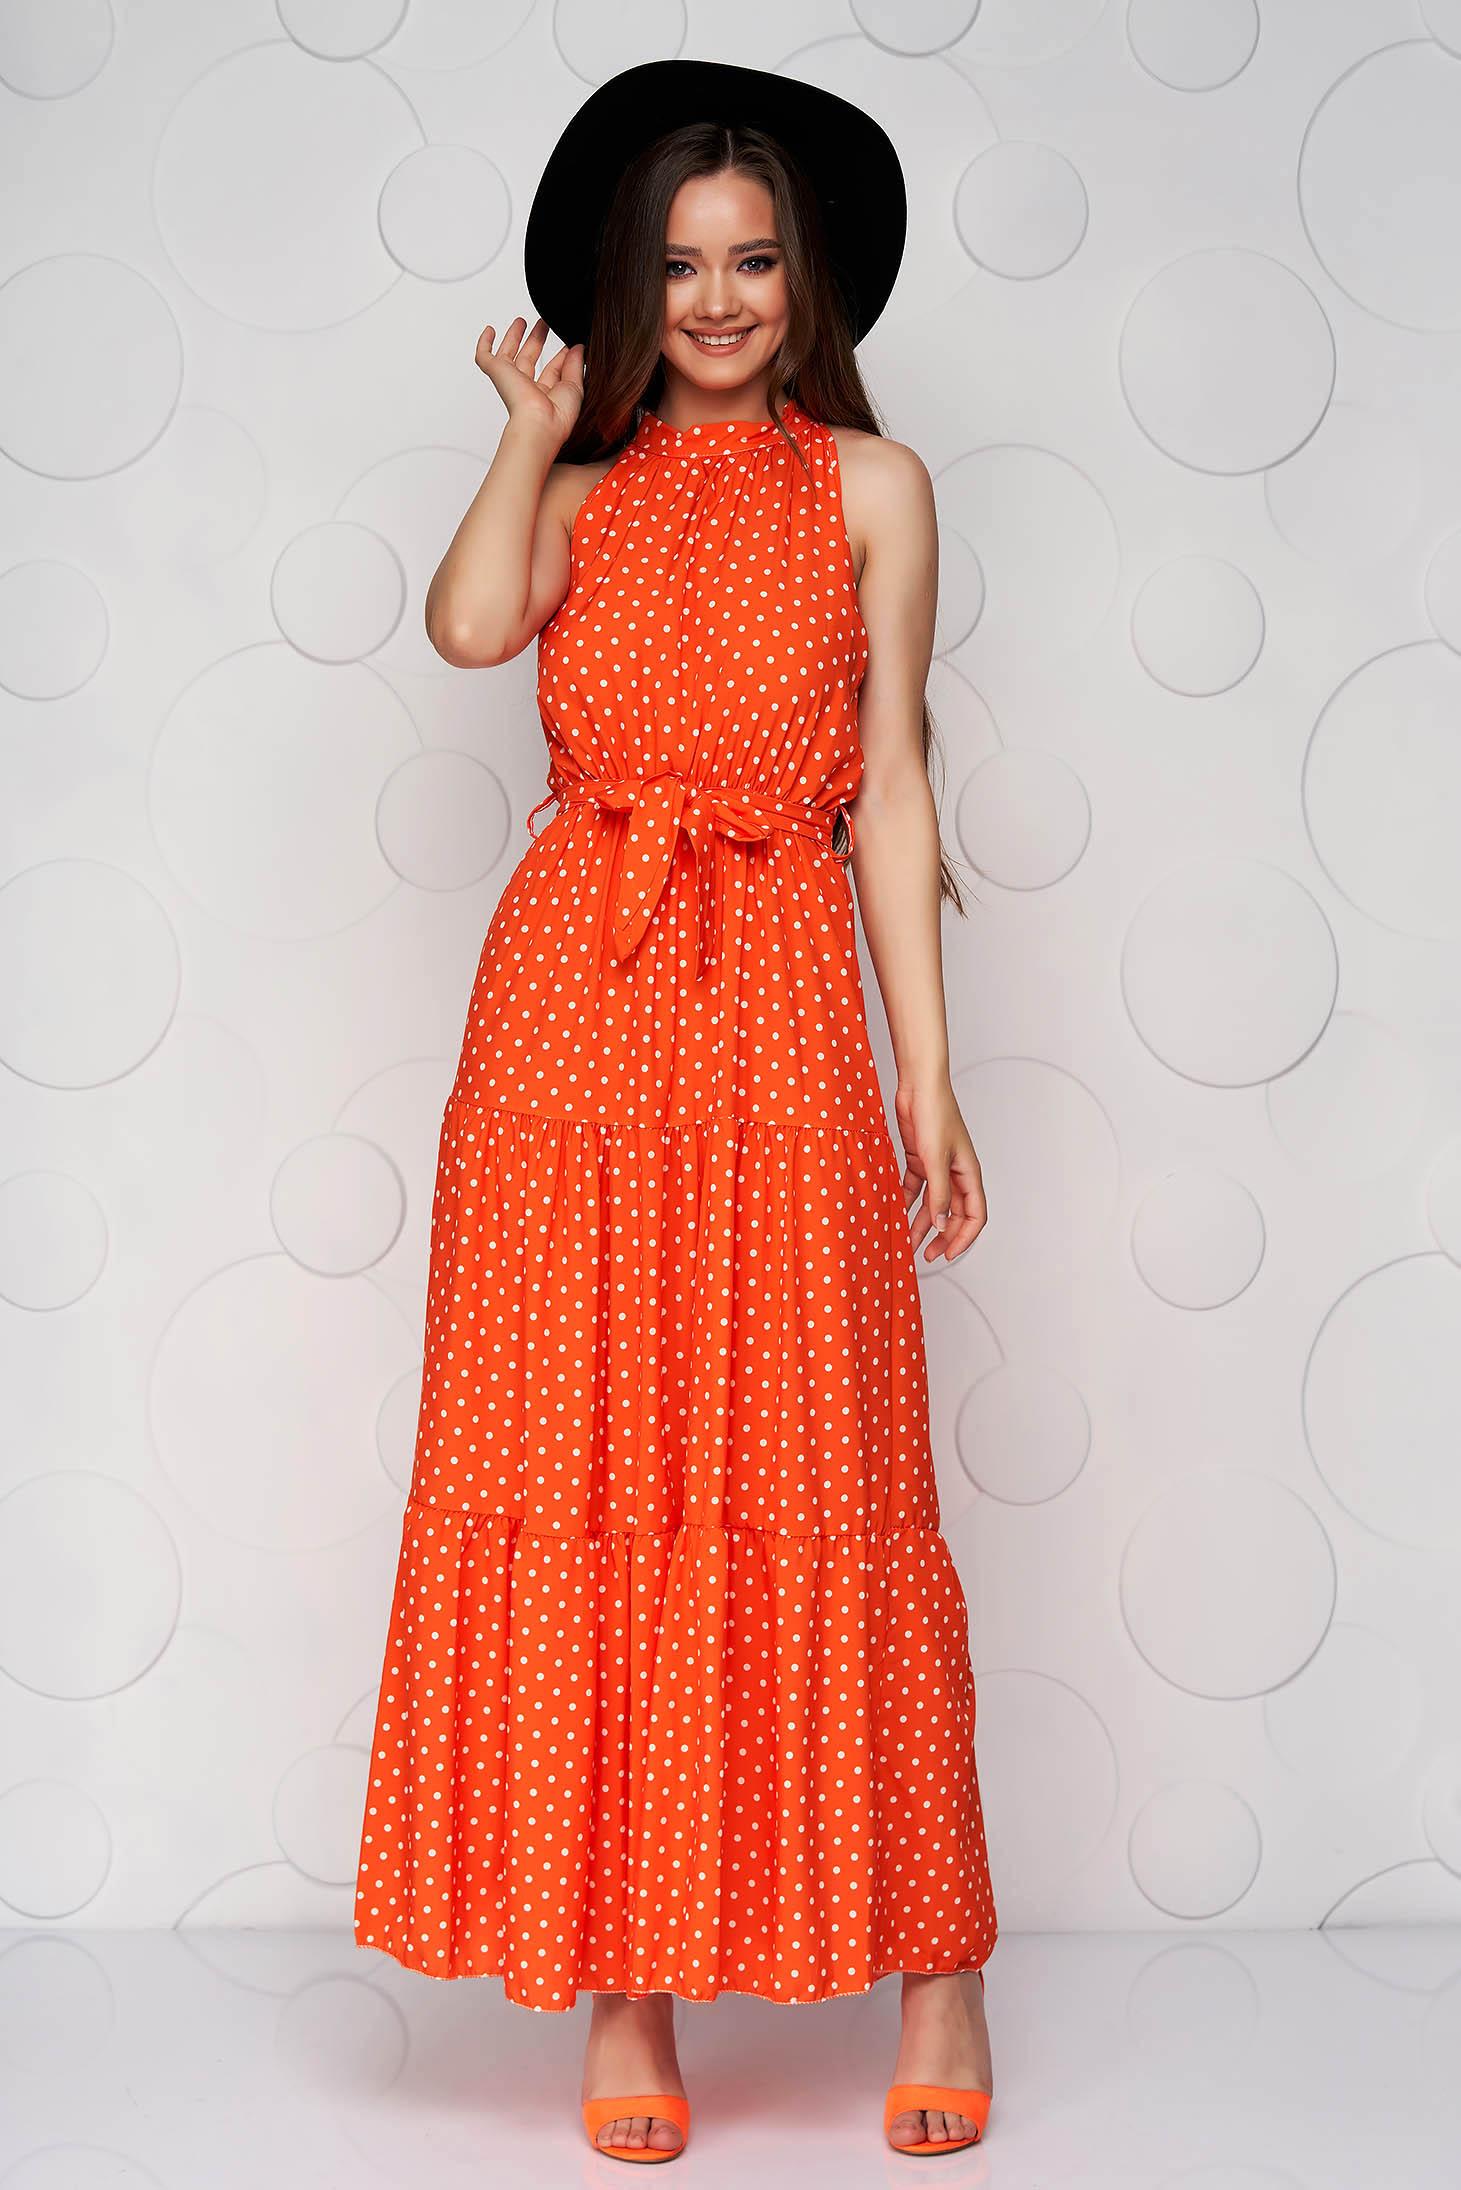 Rochie SunShine portocalie din material vaporos in clos cu buline si guler tip halter